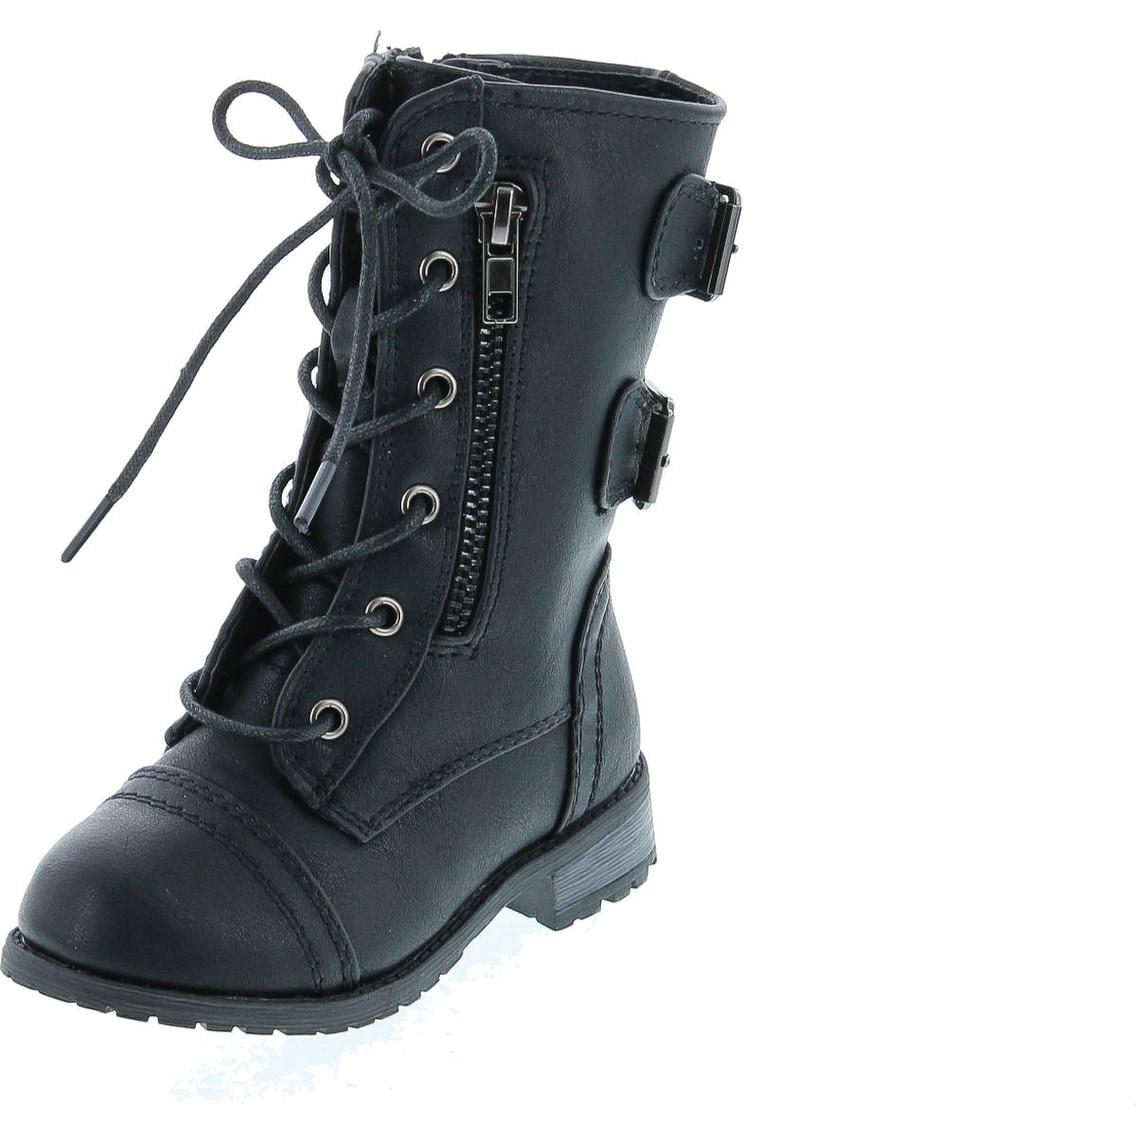 Boots Black Toddler